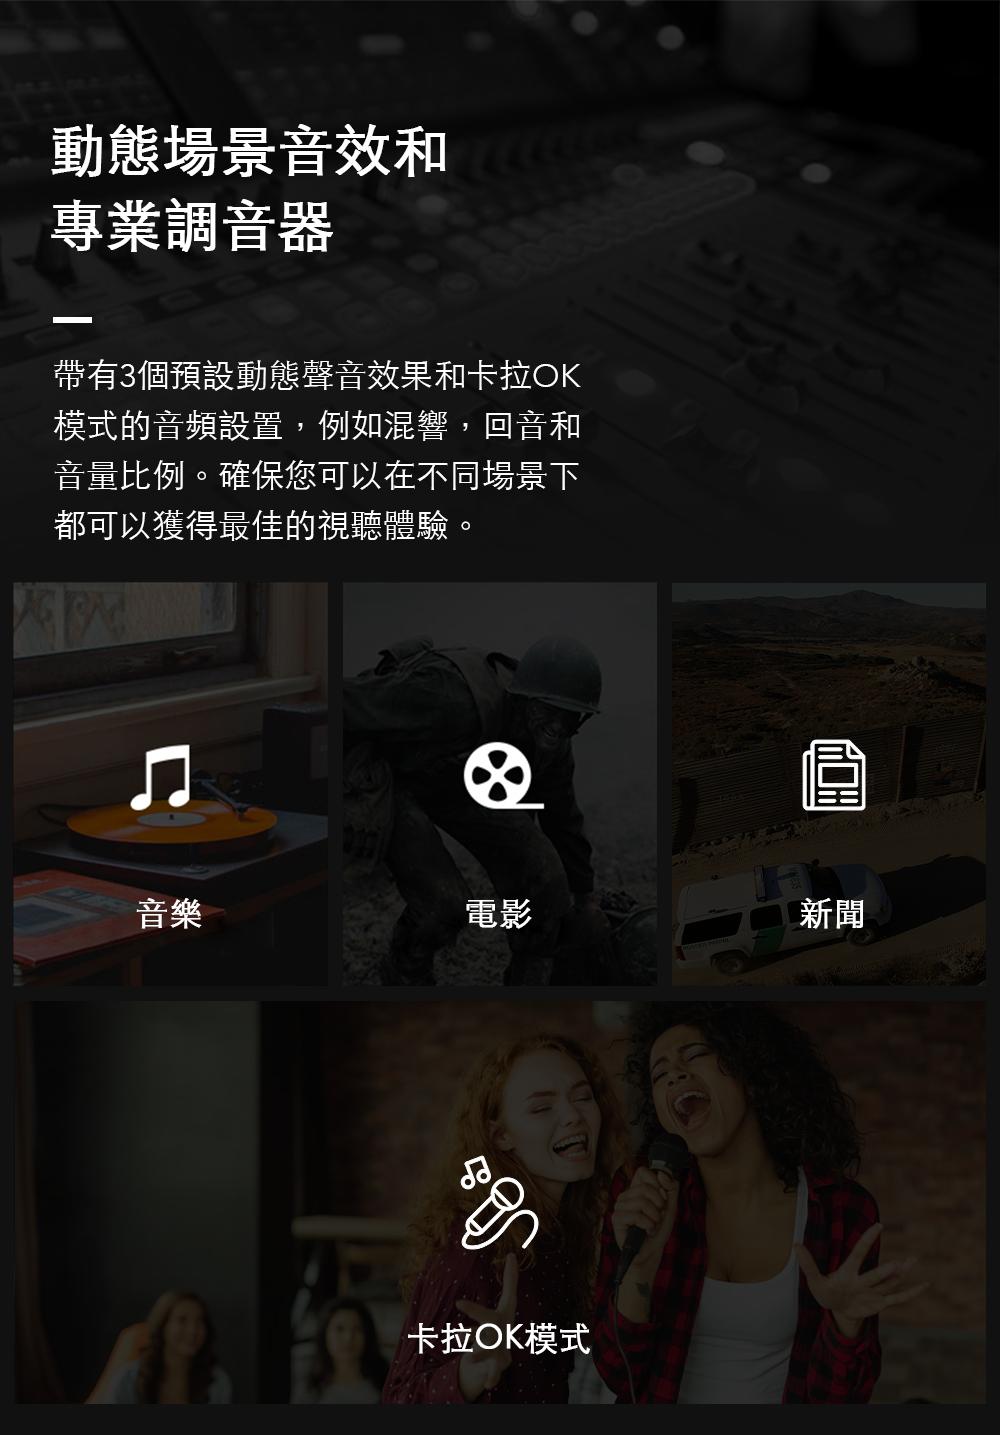 JBL-CINEMA-KTV350-Catalogue-(繁體中文)7.png